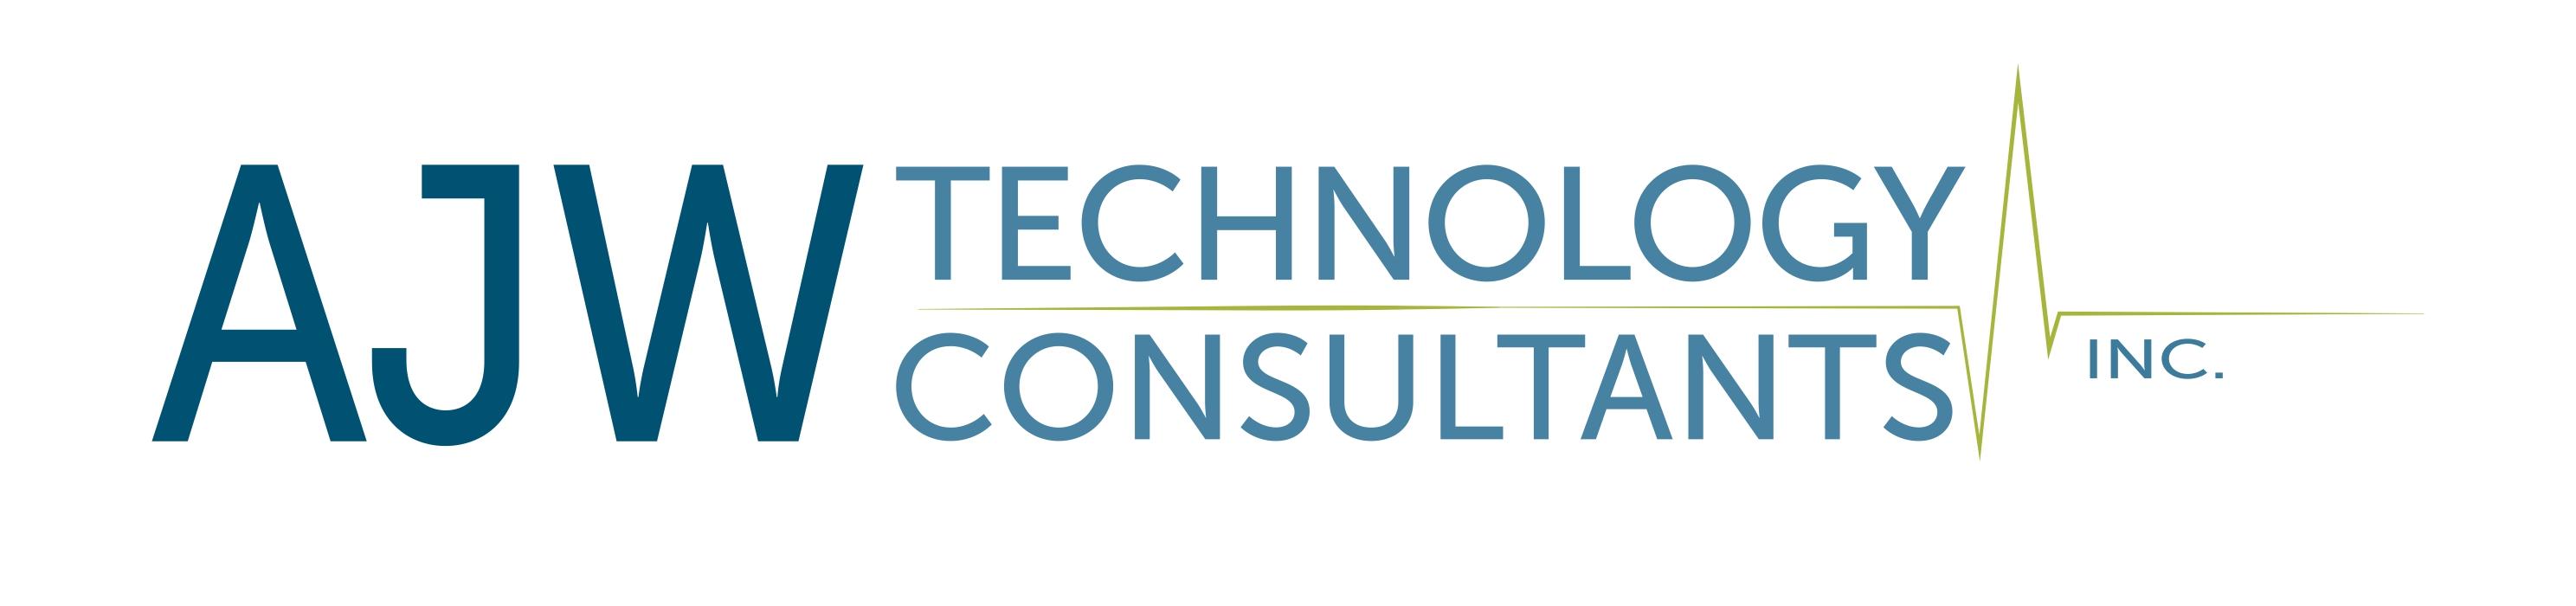 AJW Technology Consultants